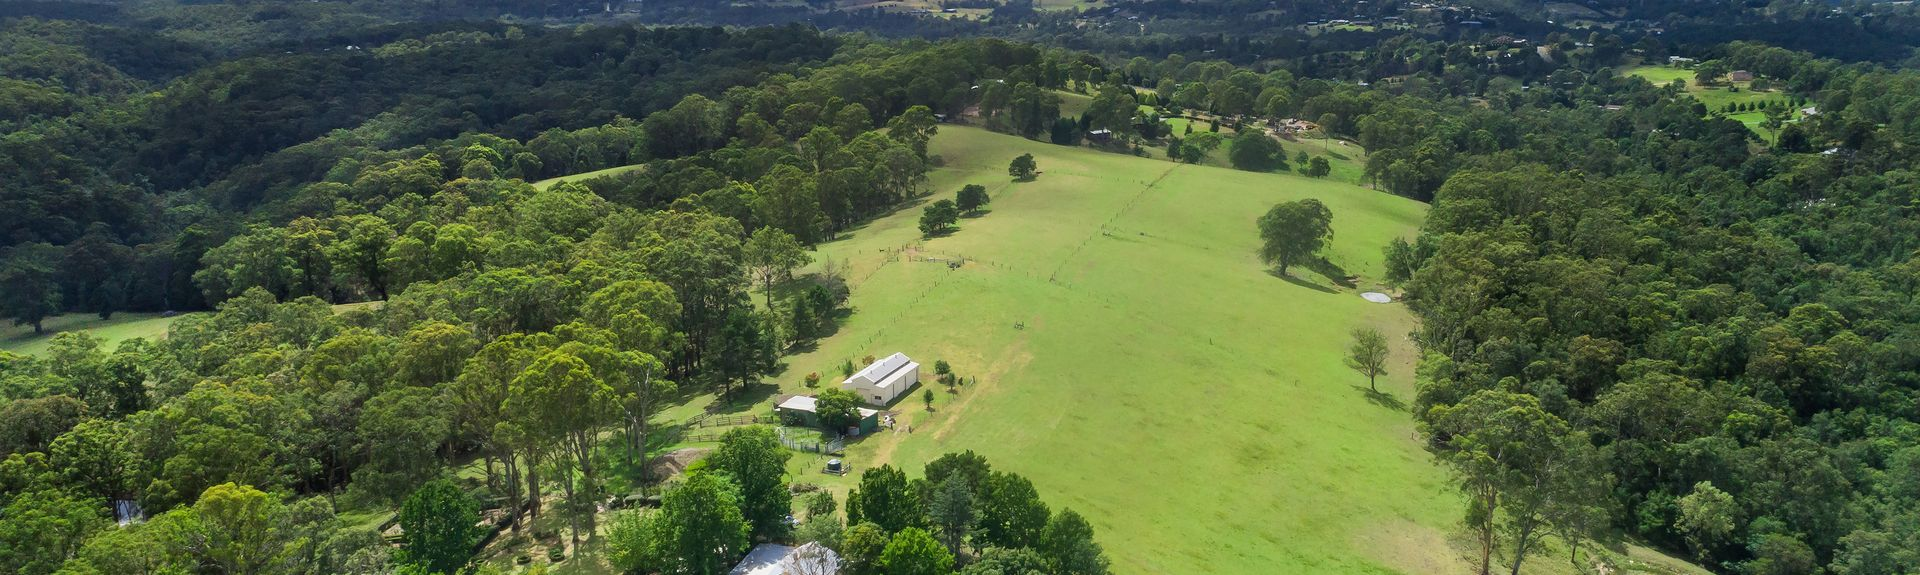 Springwood, Sydney, New South Wales, Australië